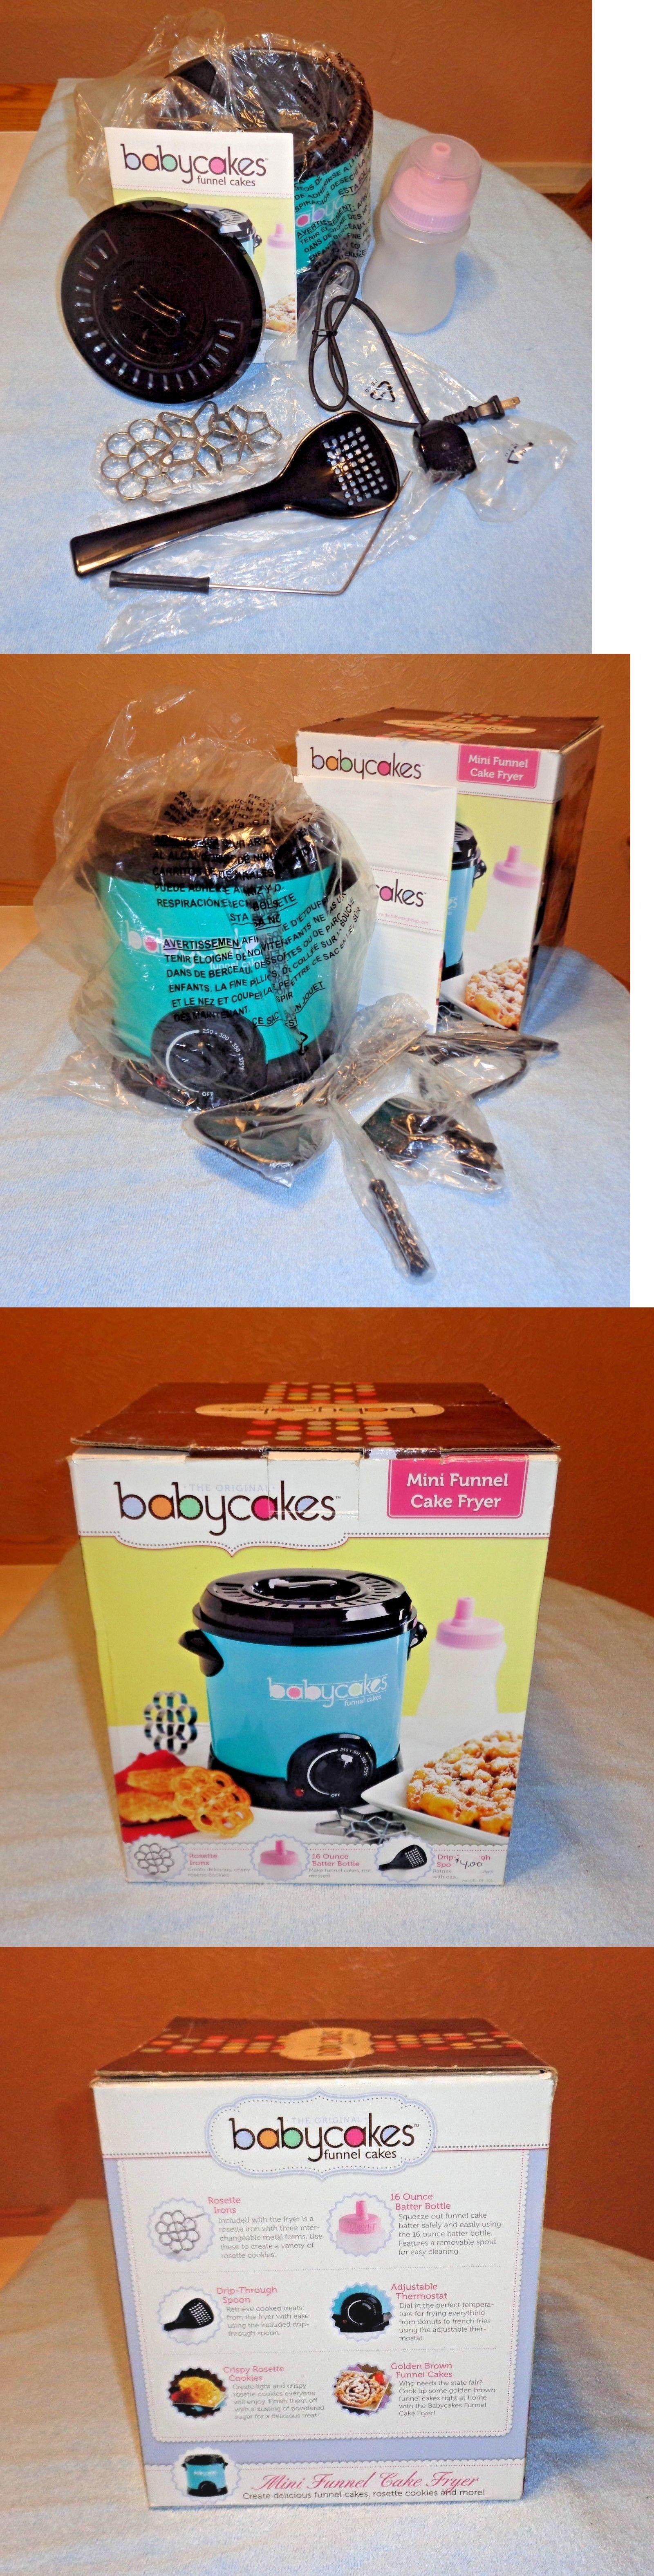 Cupcake pie and dessert makers 122928 babycakes mini